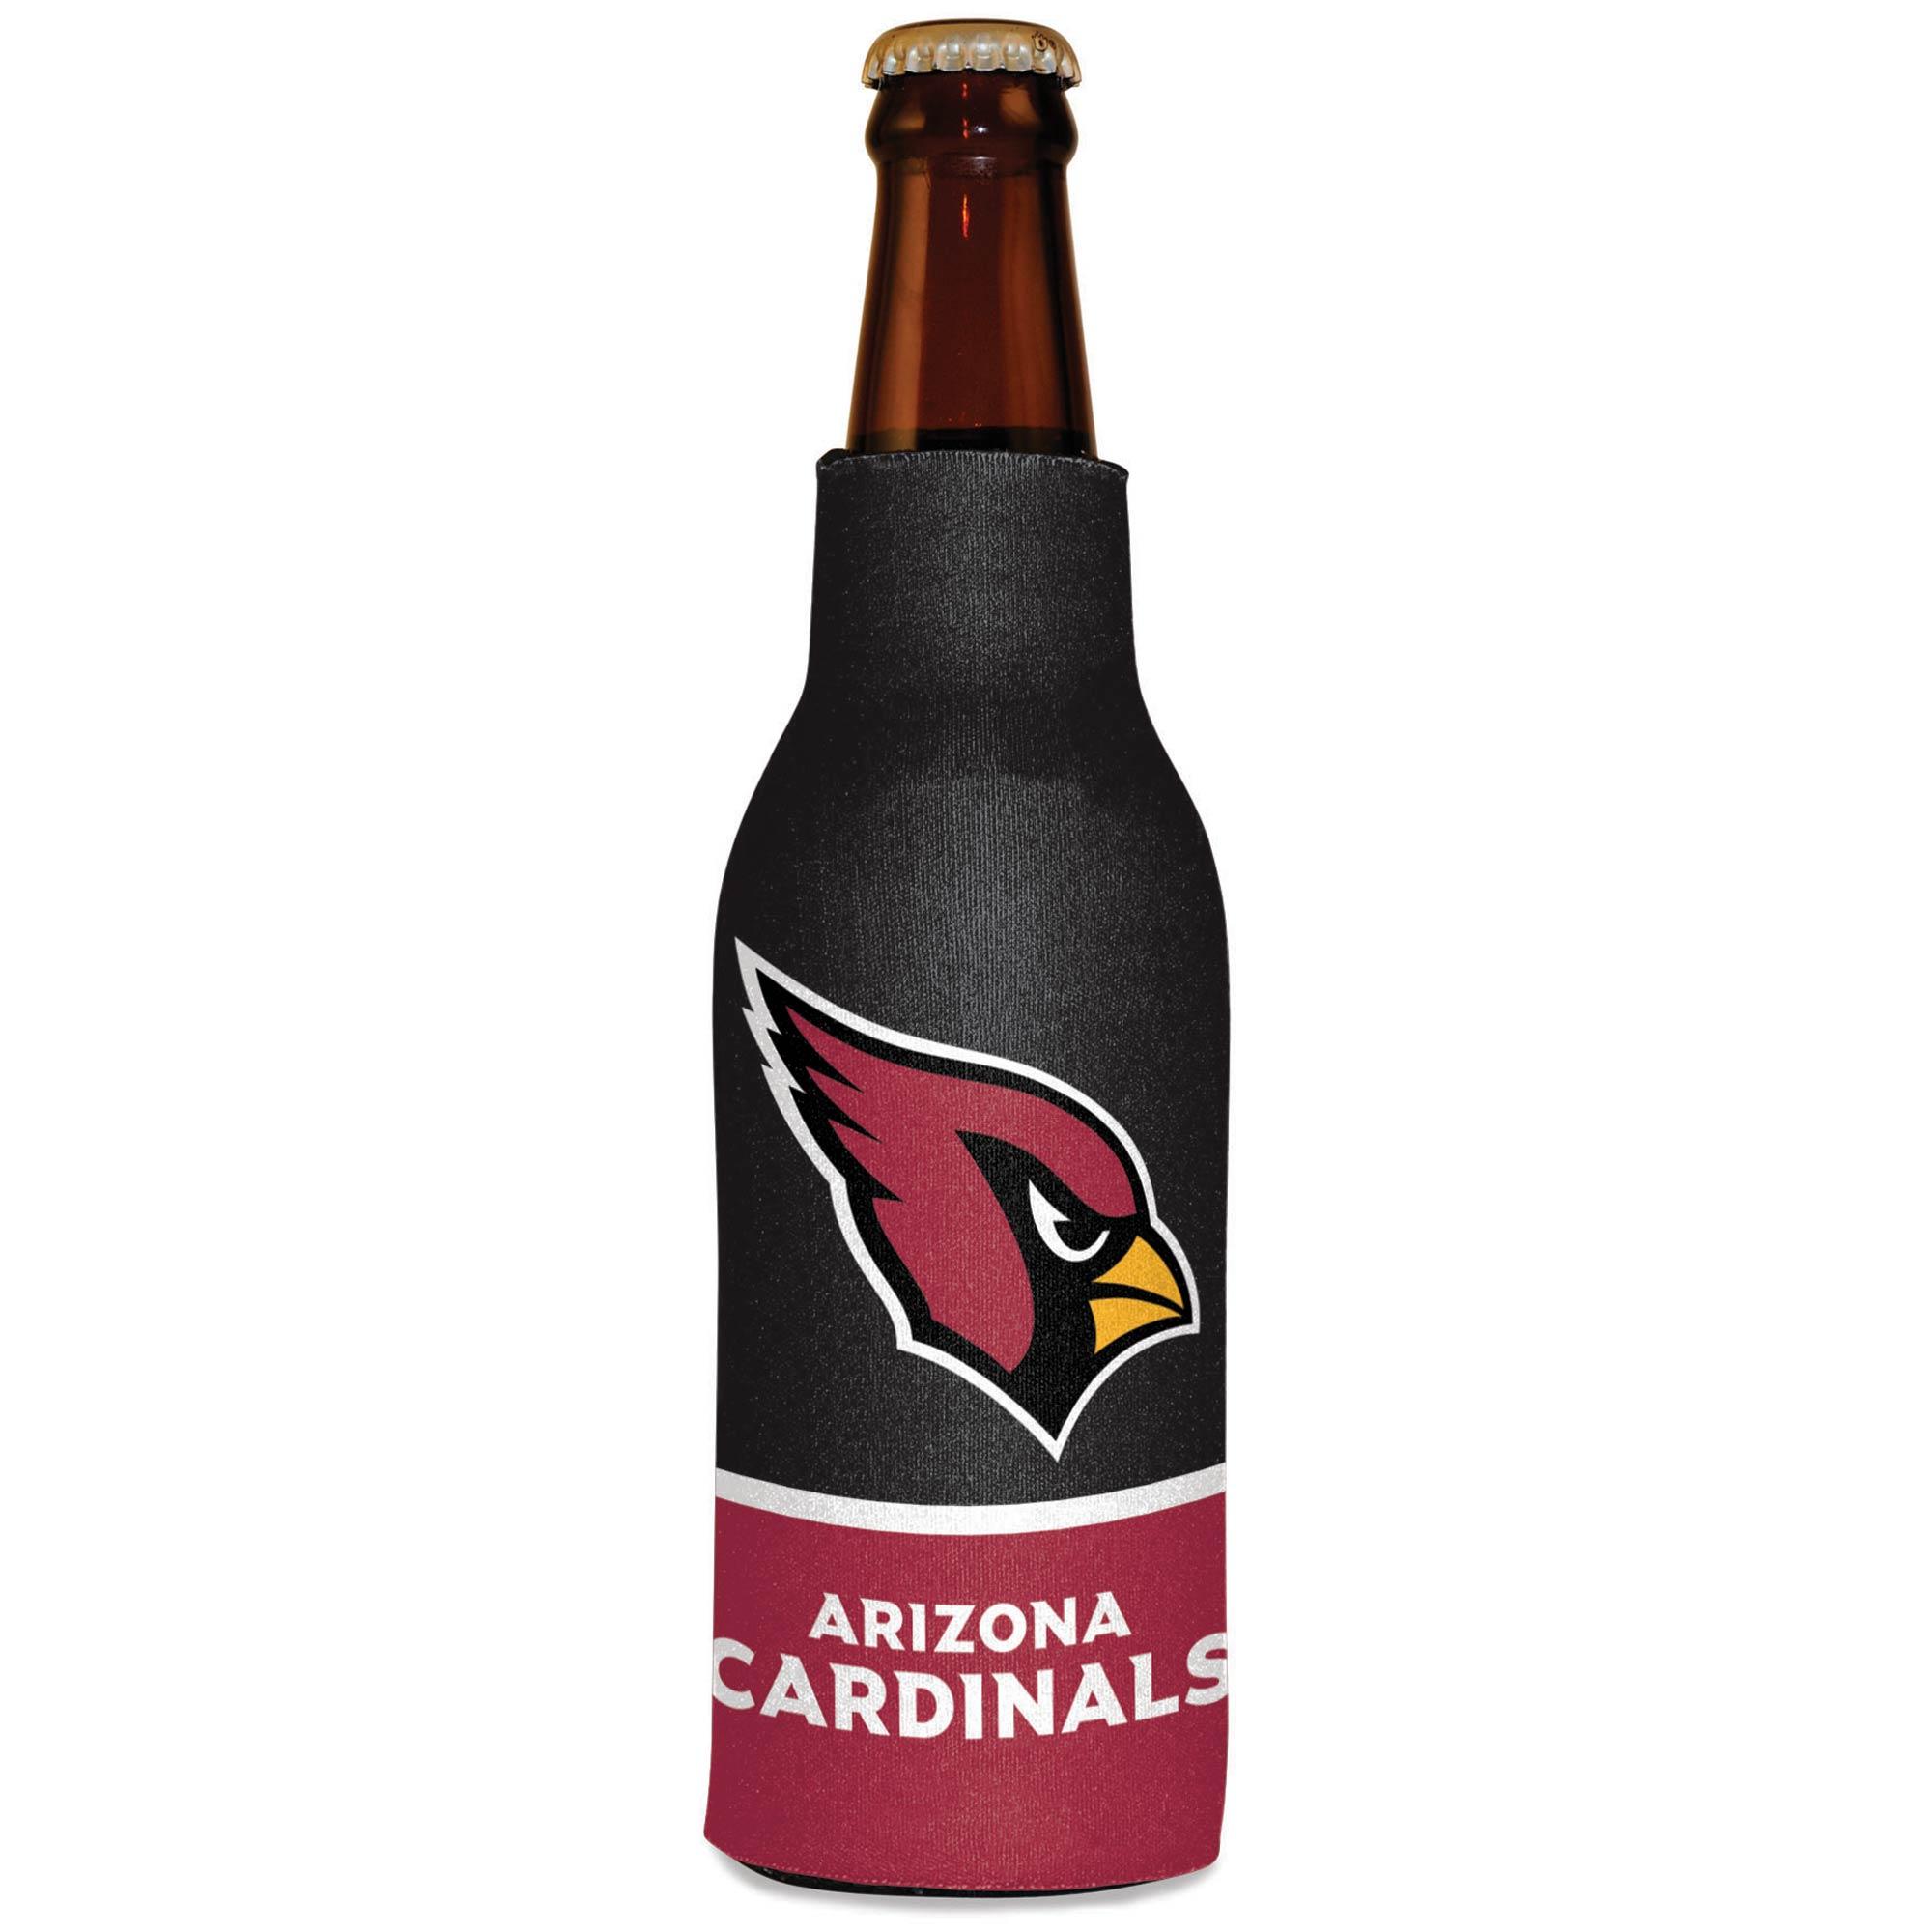 Arizona Cardinals WinCraft 12oz. Bottle Cooler